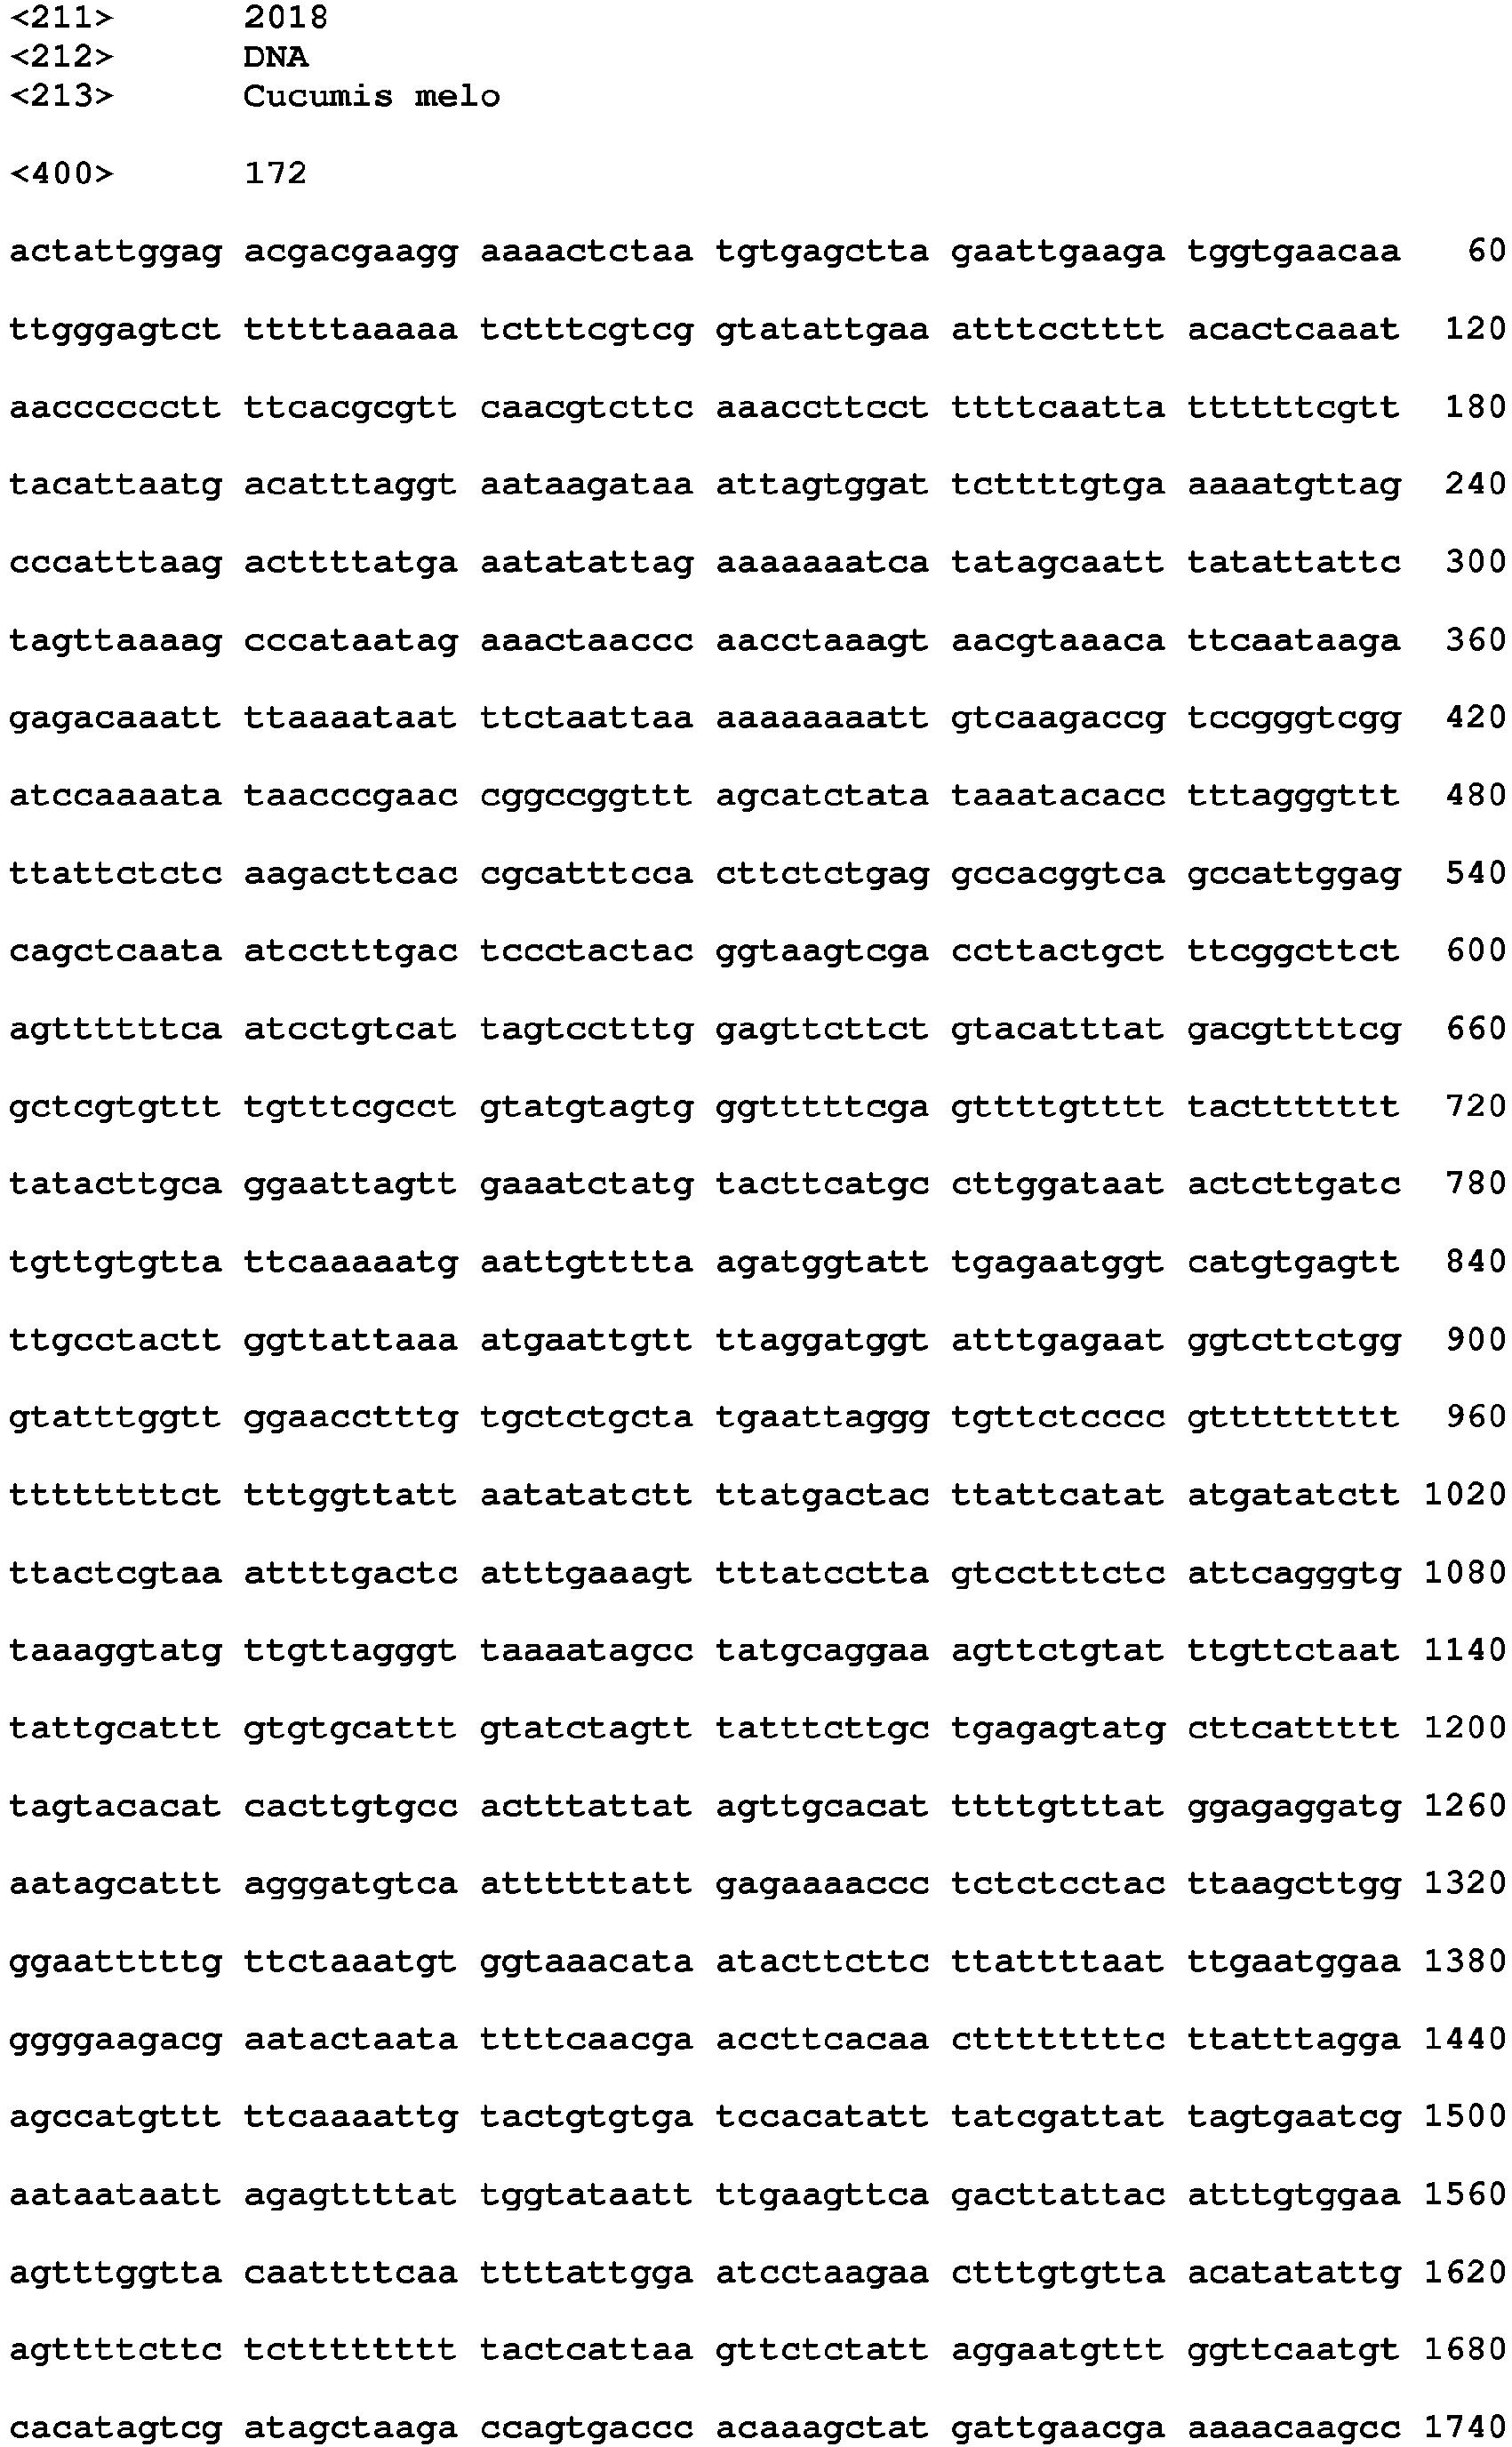 Figure imgb0202